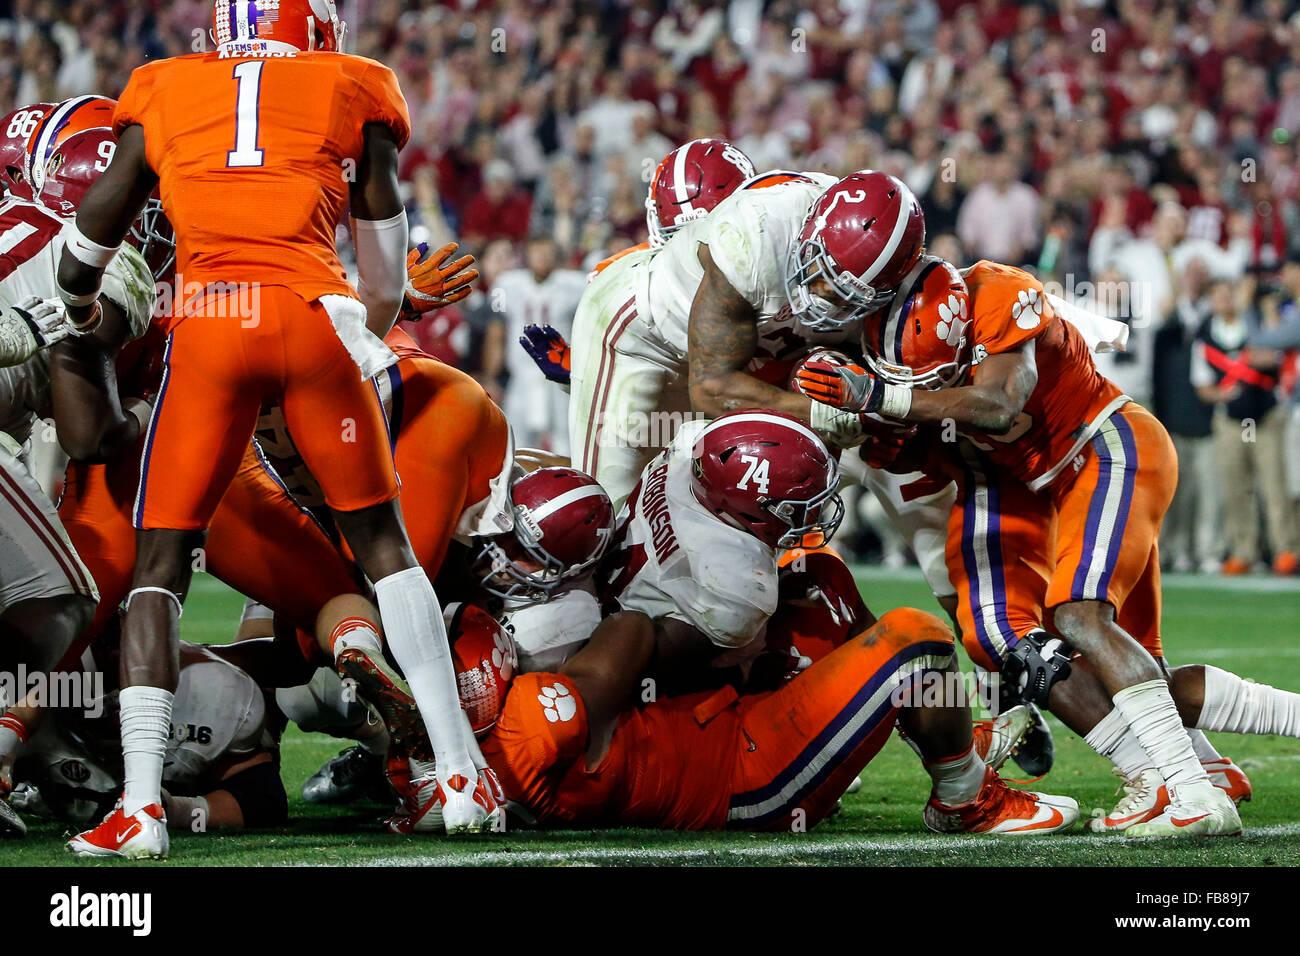 Video: 2015 Alabama Football Season Celebrated with Videos on Youtube